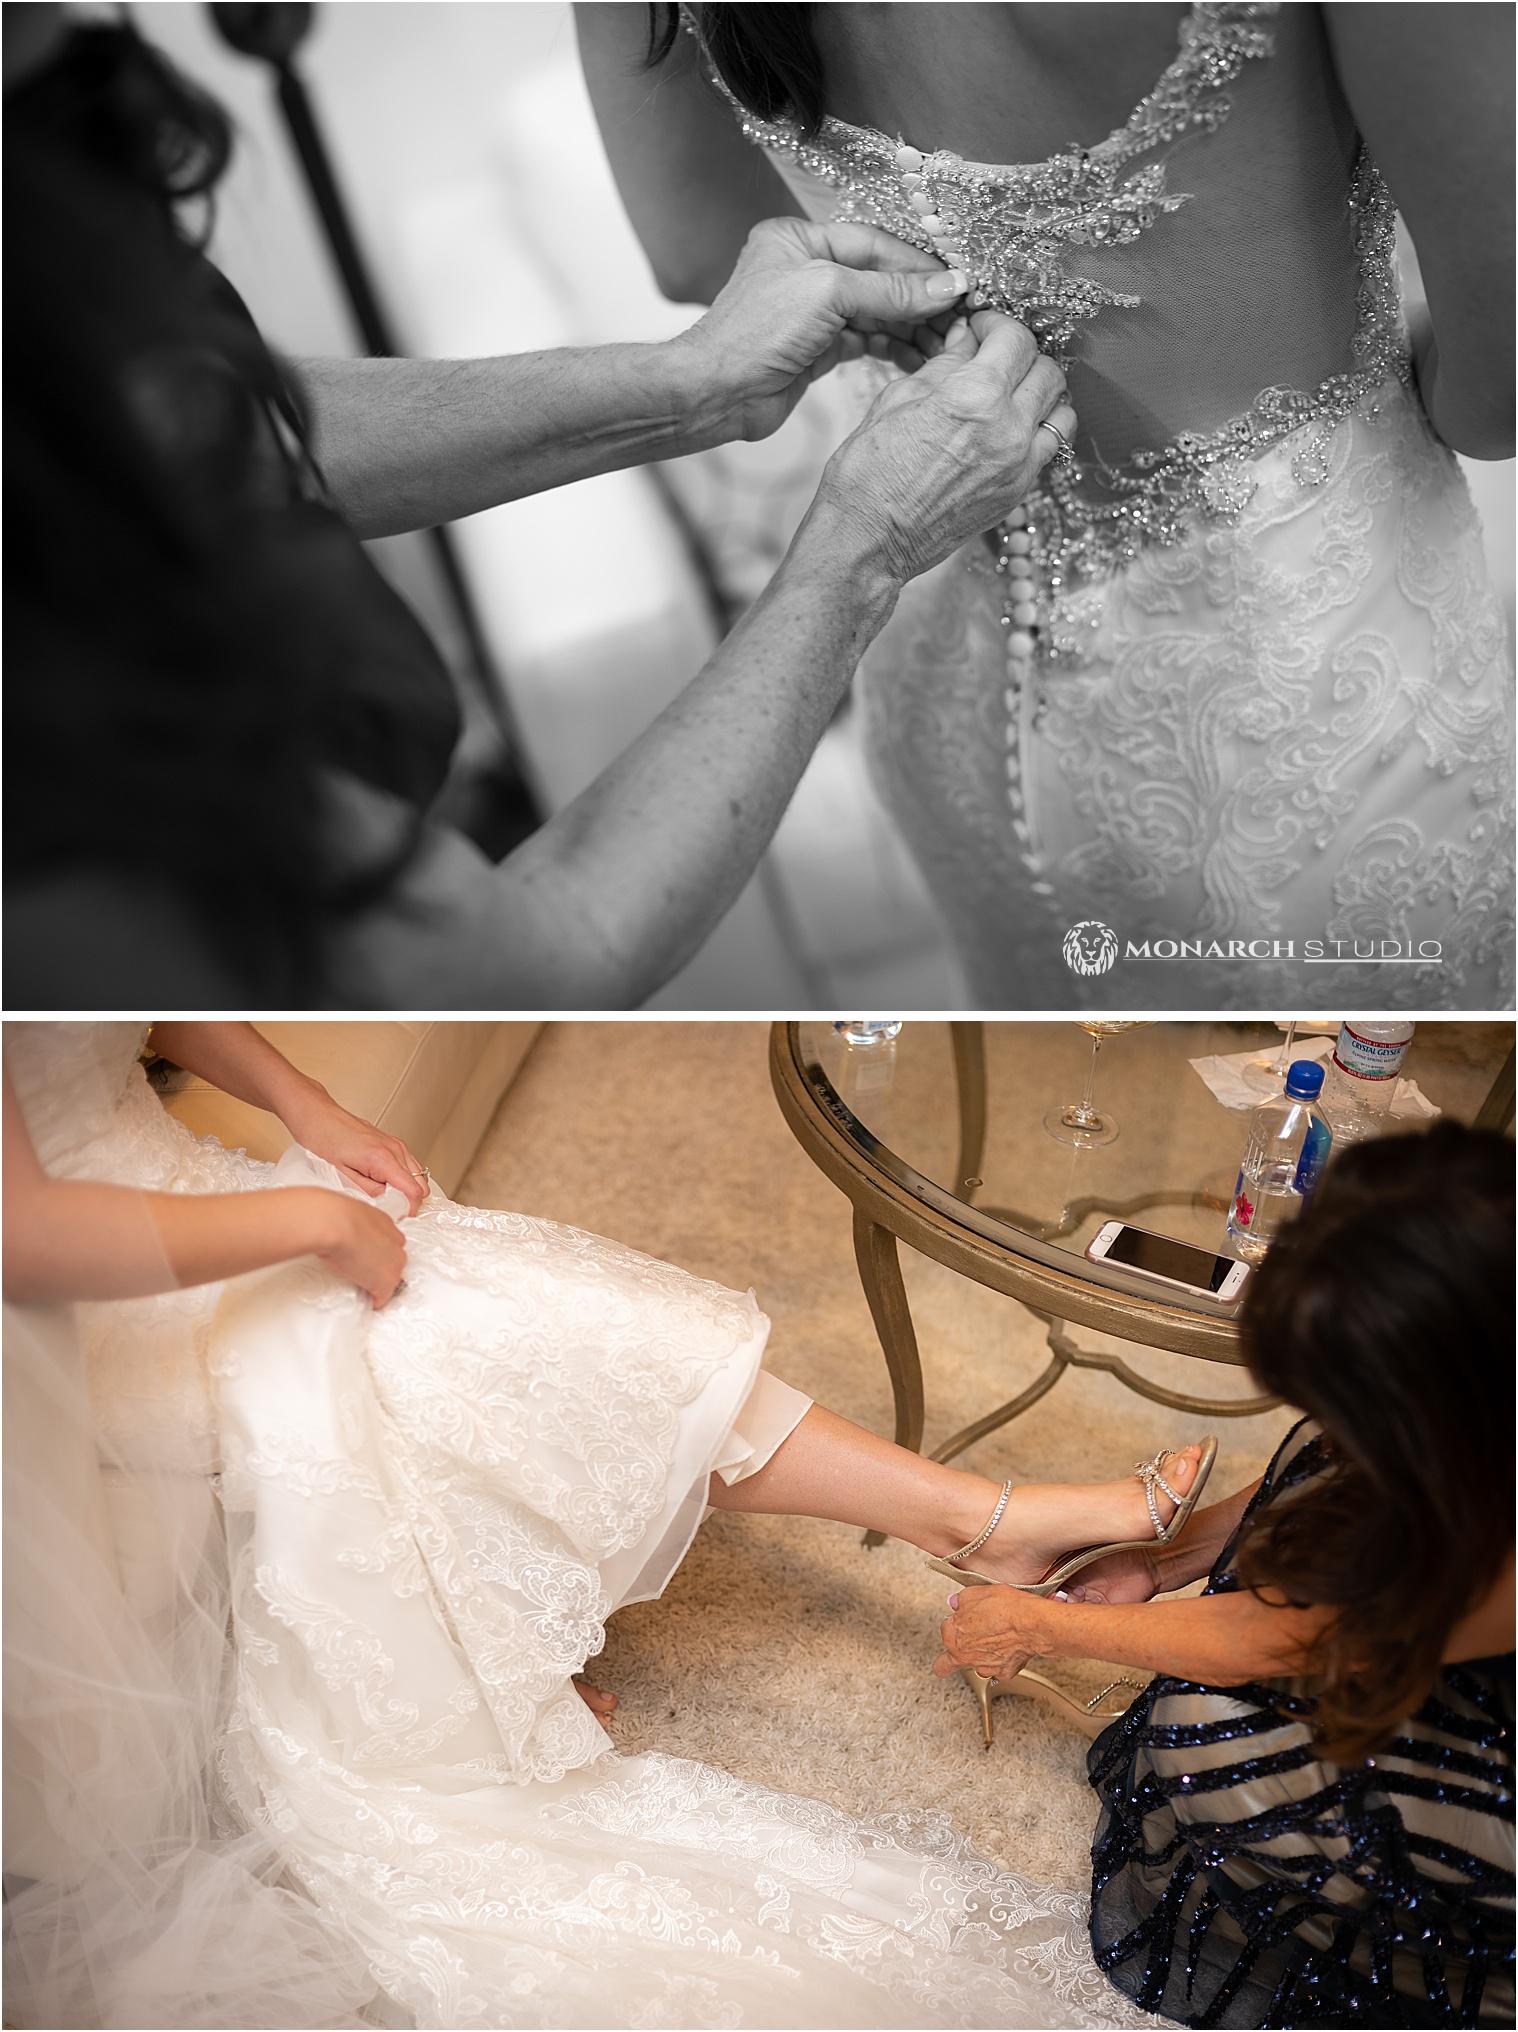 saint-augustine-wedding-photographer-treasury-010.jpg